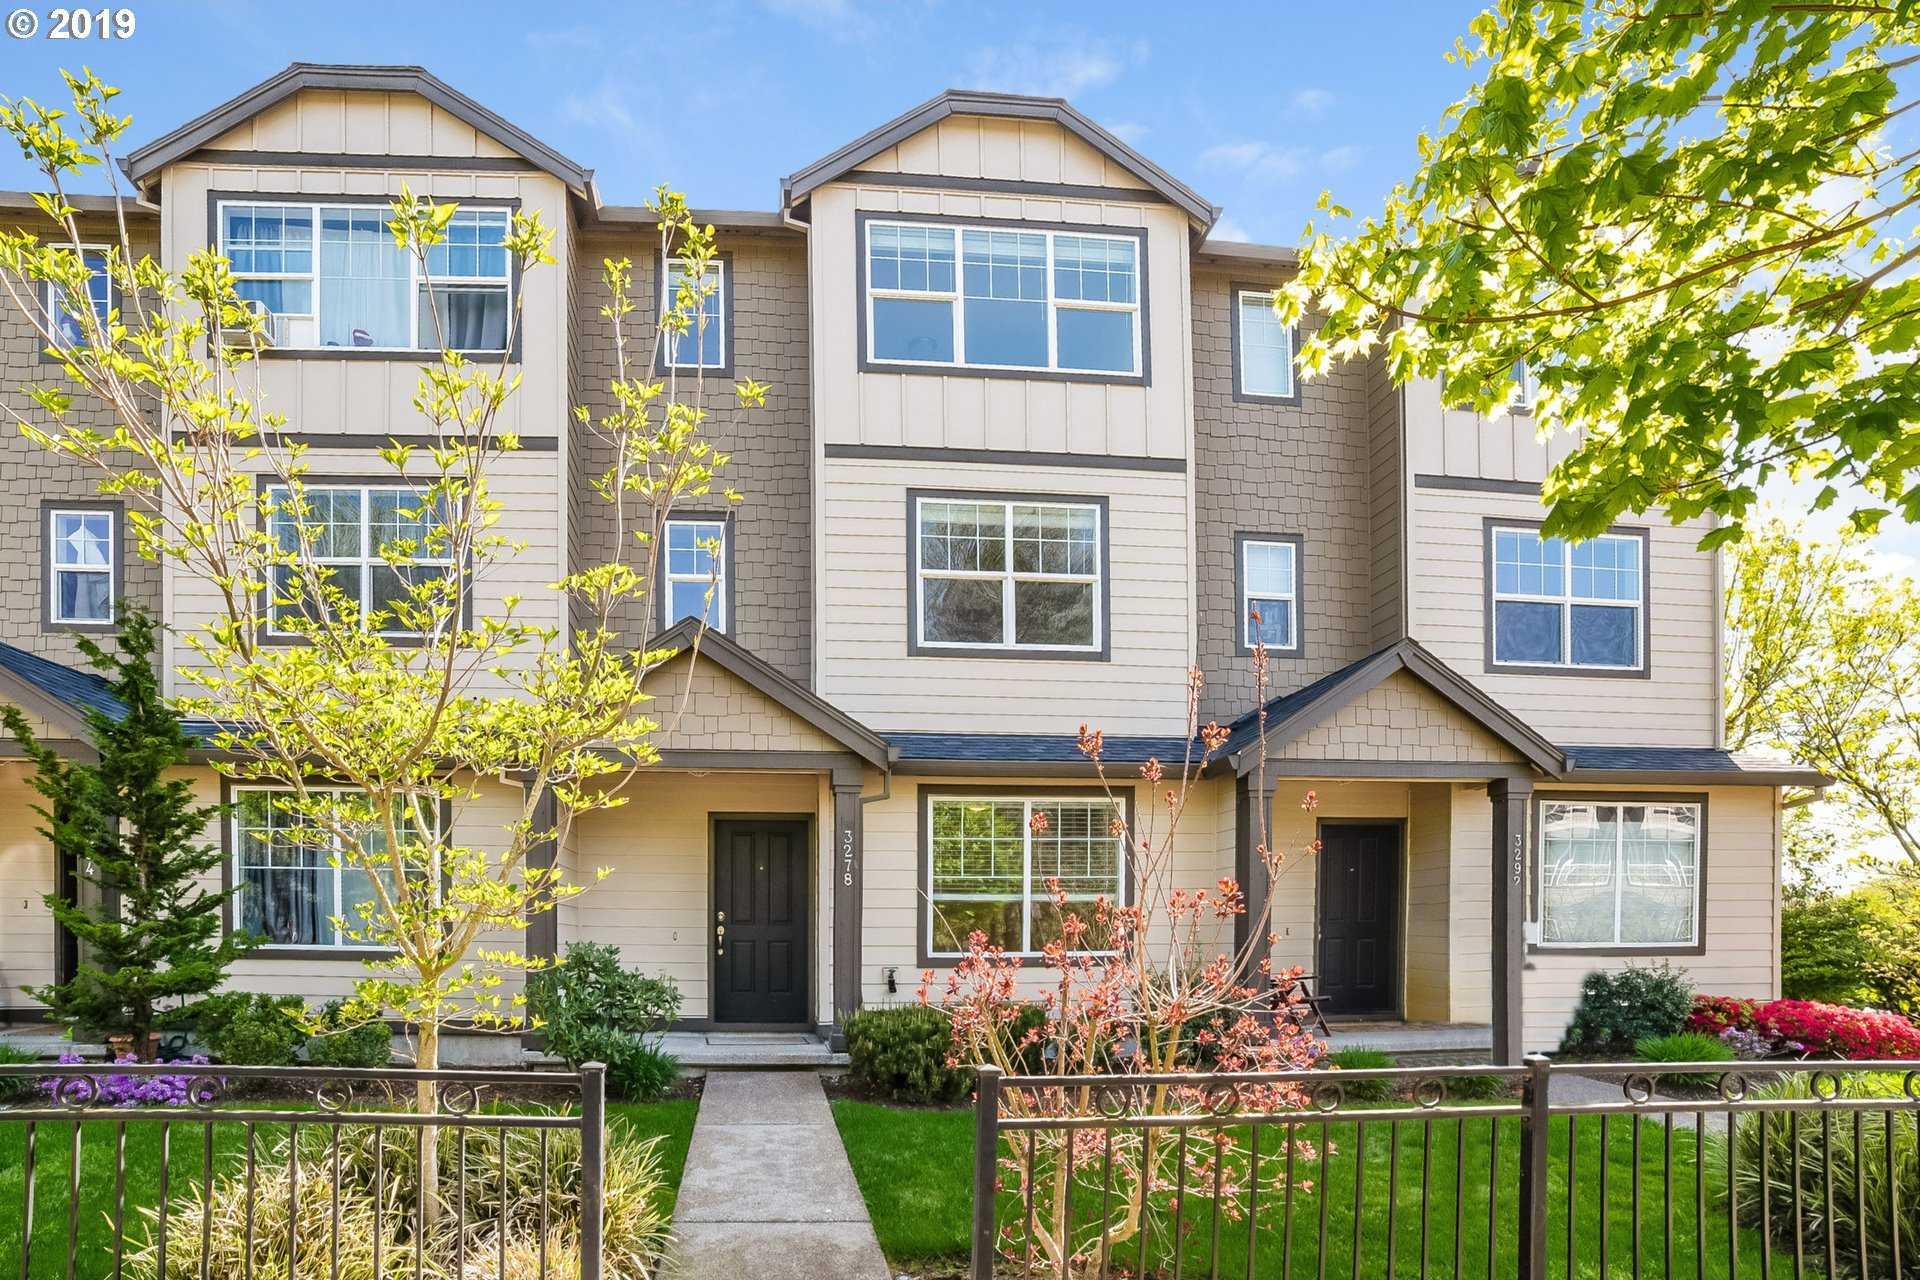 $333,000 - 4Br/4Ba -  for Sale in Hillsboro